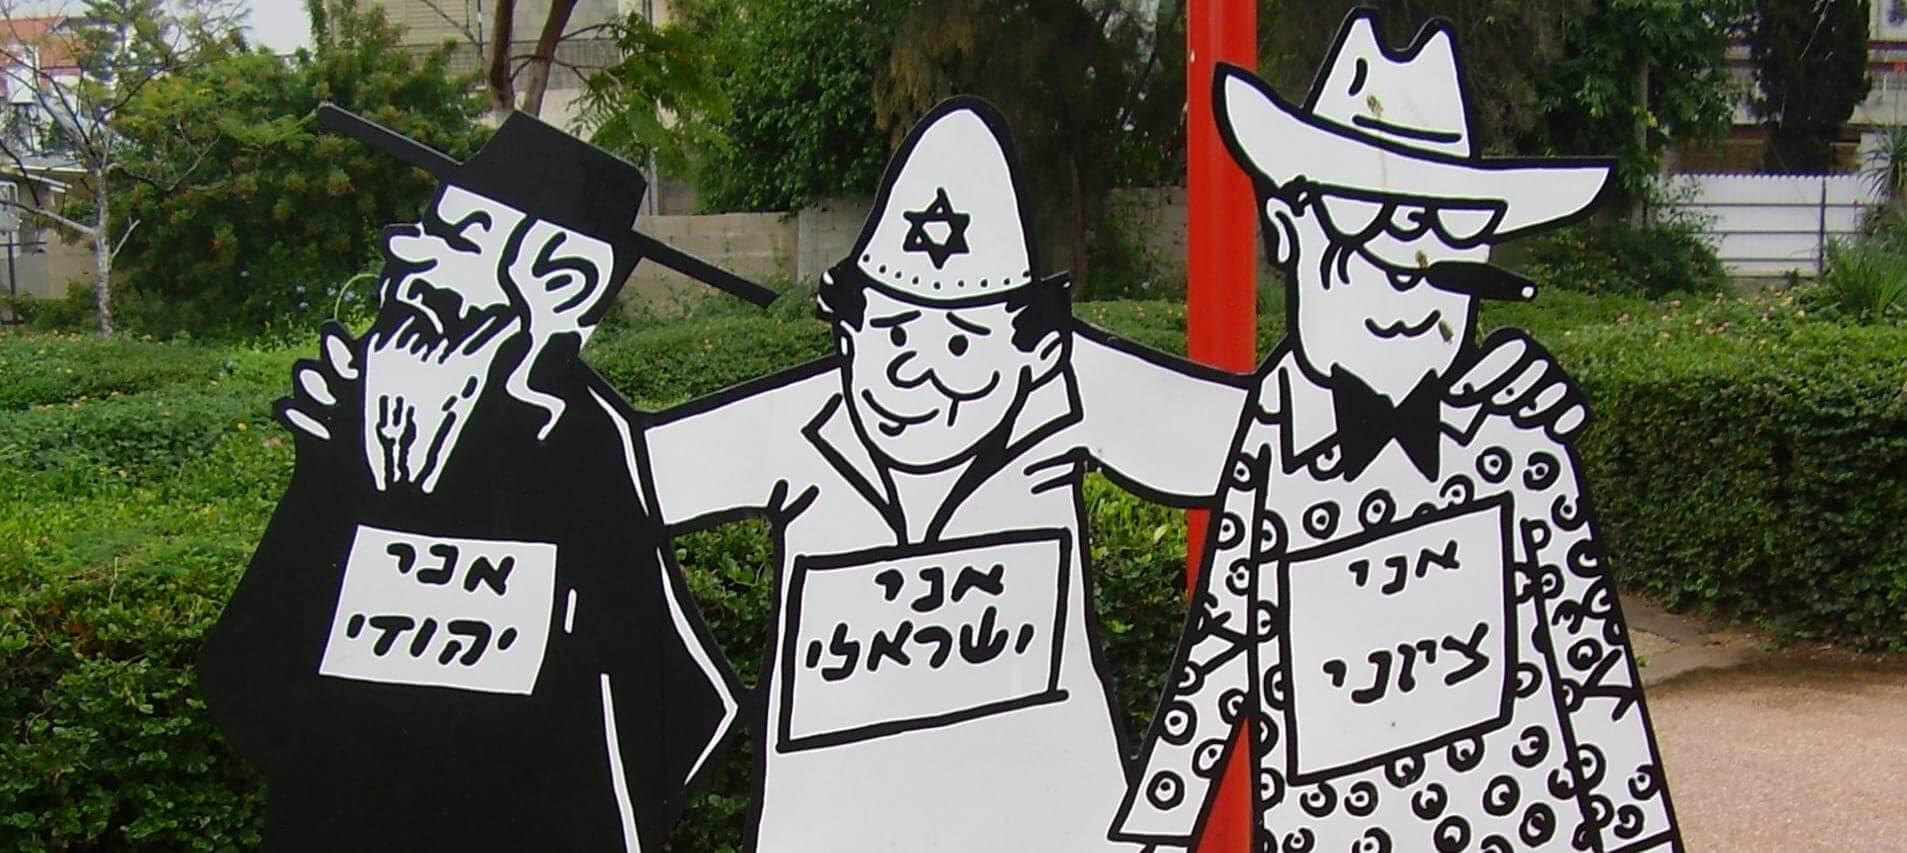 Dr. Avishai Teicher Pikiwiki Israel [CC BY 2.5], via Wikimedia Commons קרדיט לתמונה